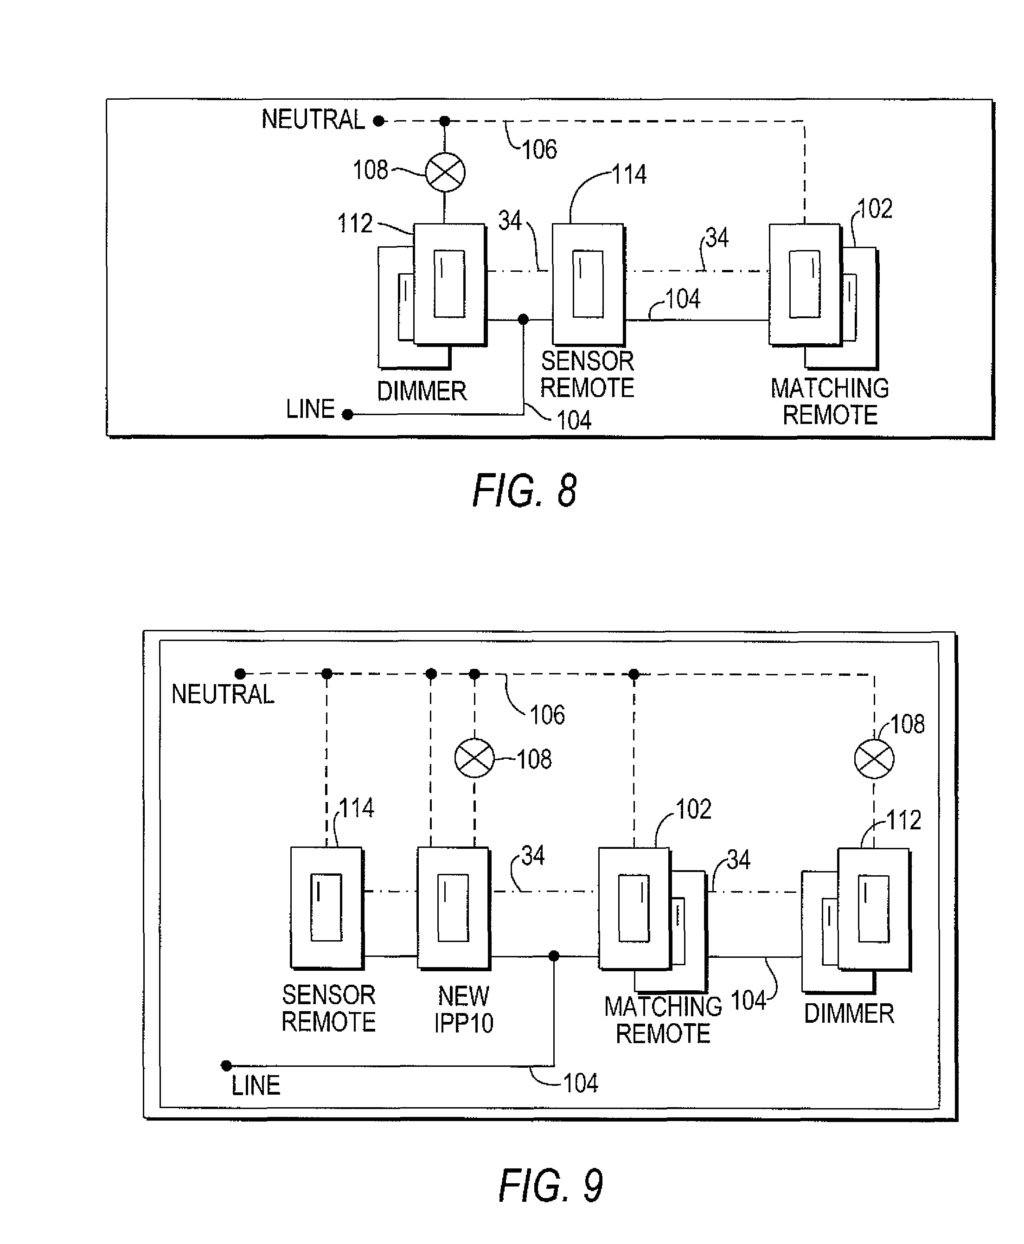 Lutron 4 Way Dimmer Wiring Diagram Jerrysmasterkeyforyouand Me 4 Pole Dimmer Switch Lutron 4 Way Dimmer Switch